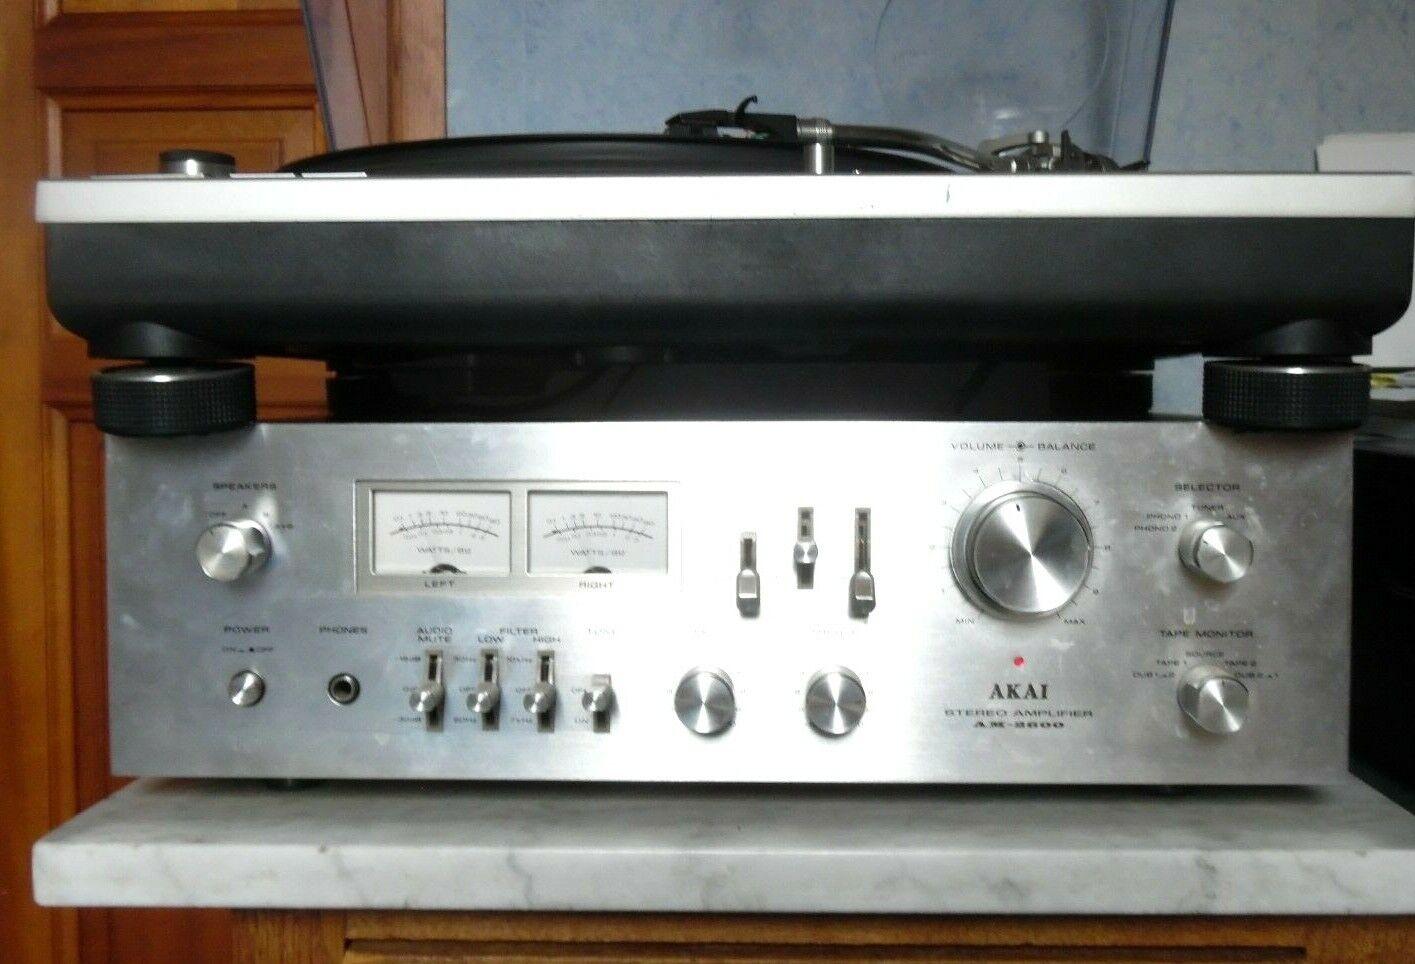 Ampli vintage akai am-2600 integrated stereo amplifier no marantz pioneer kenwoo